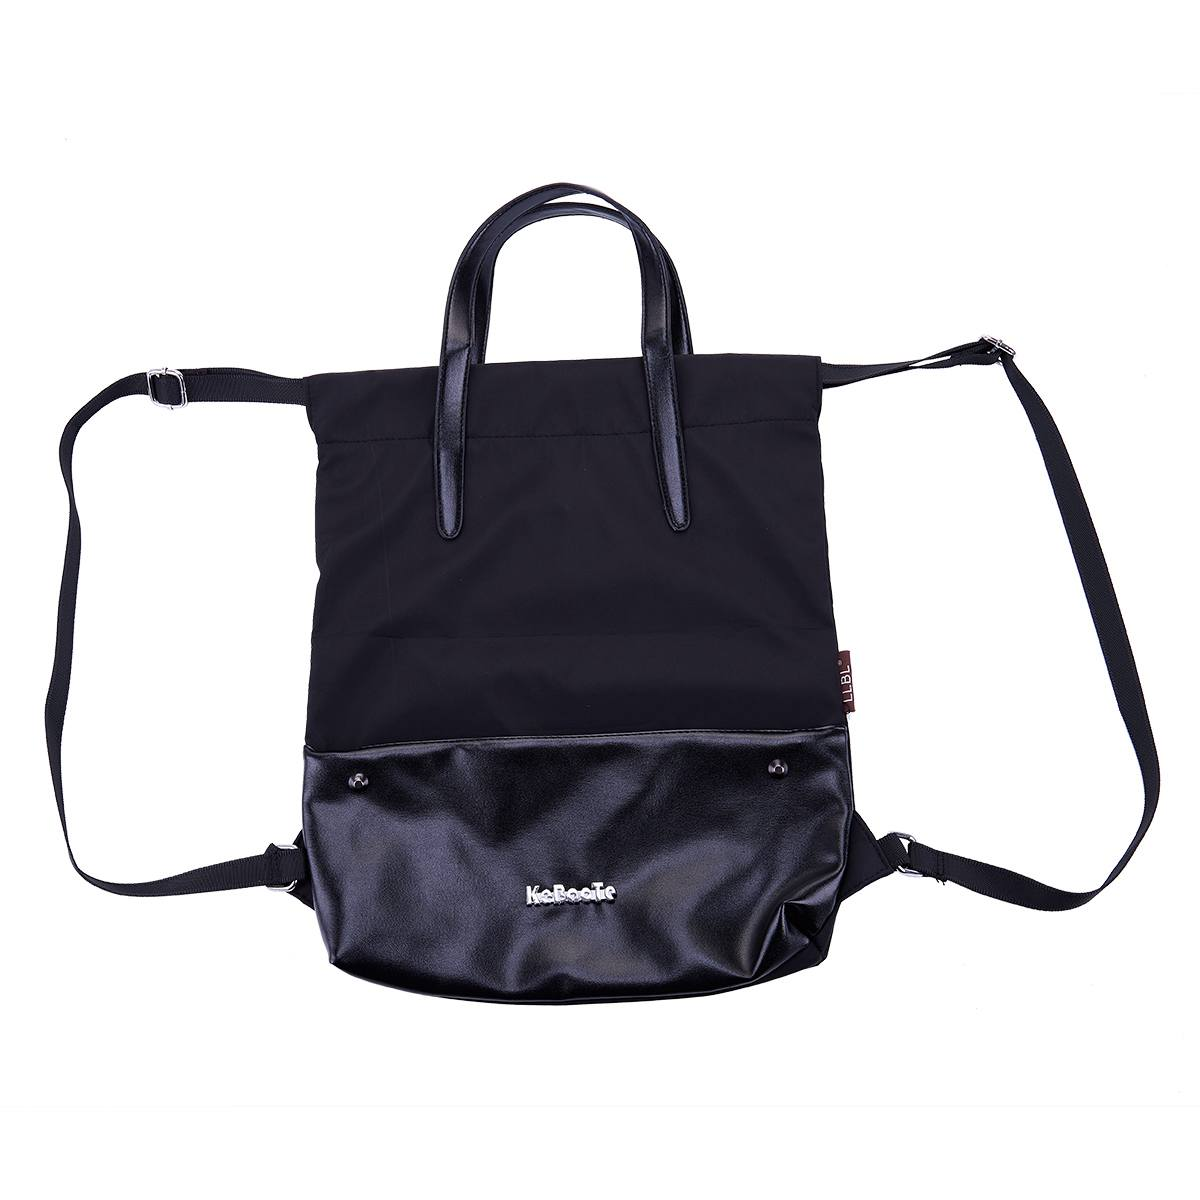 Drawstring Backpack Sport Gym String Bag Waterproof Sackpack Cinch Sack Gymsack